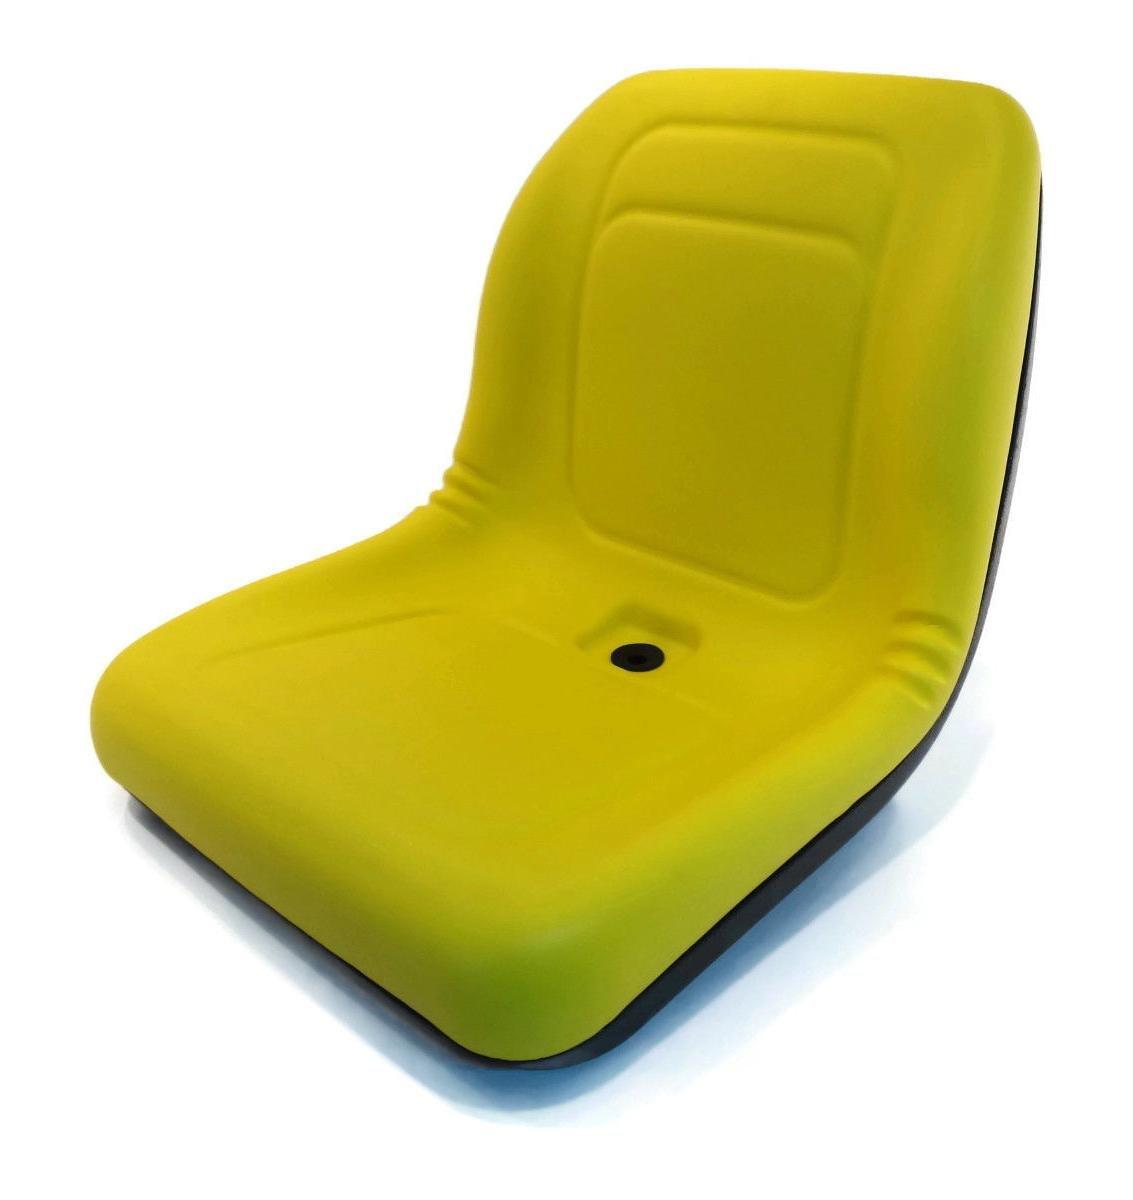 LVA10029 Seat - Yellow Fits John Deere:4200,4210,4300,4310,4400,4410,4500, A&I